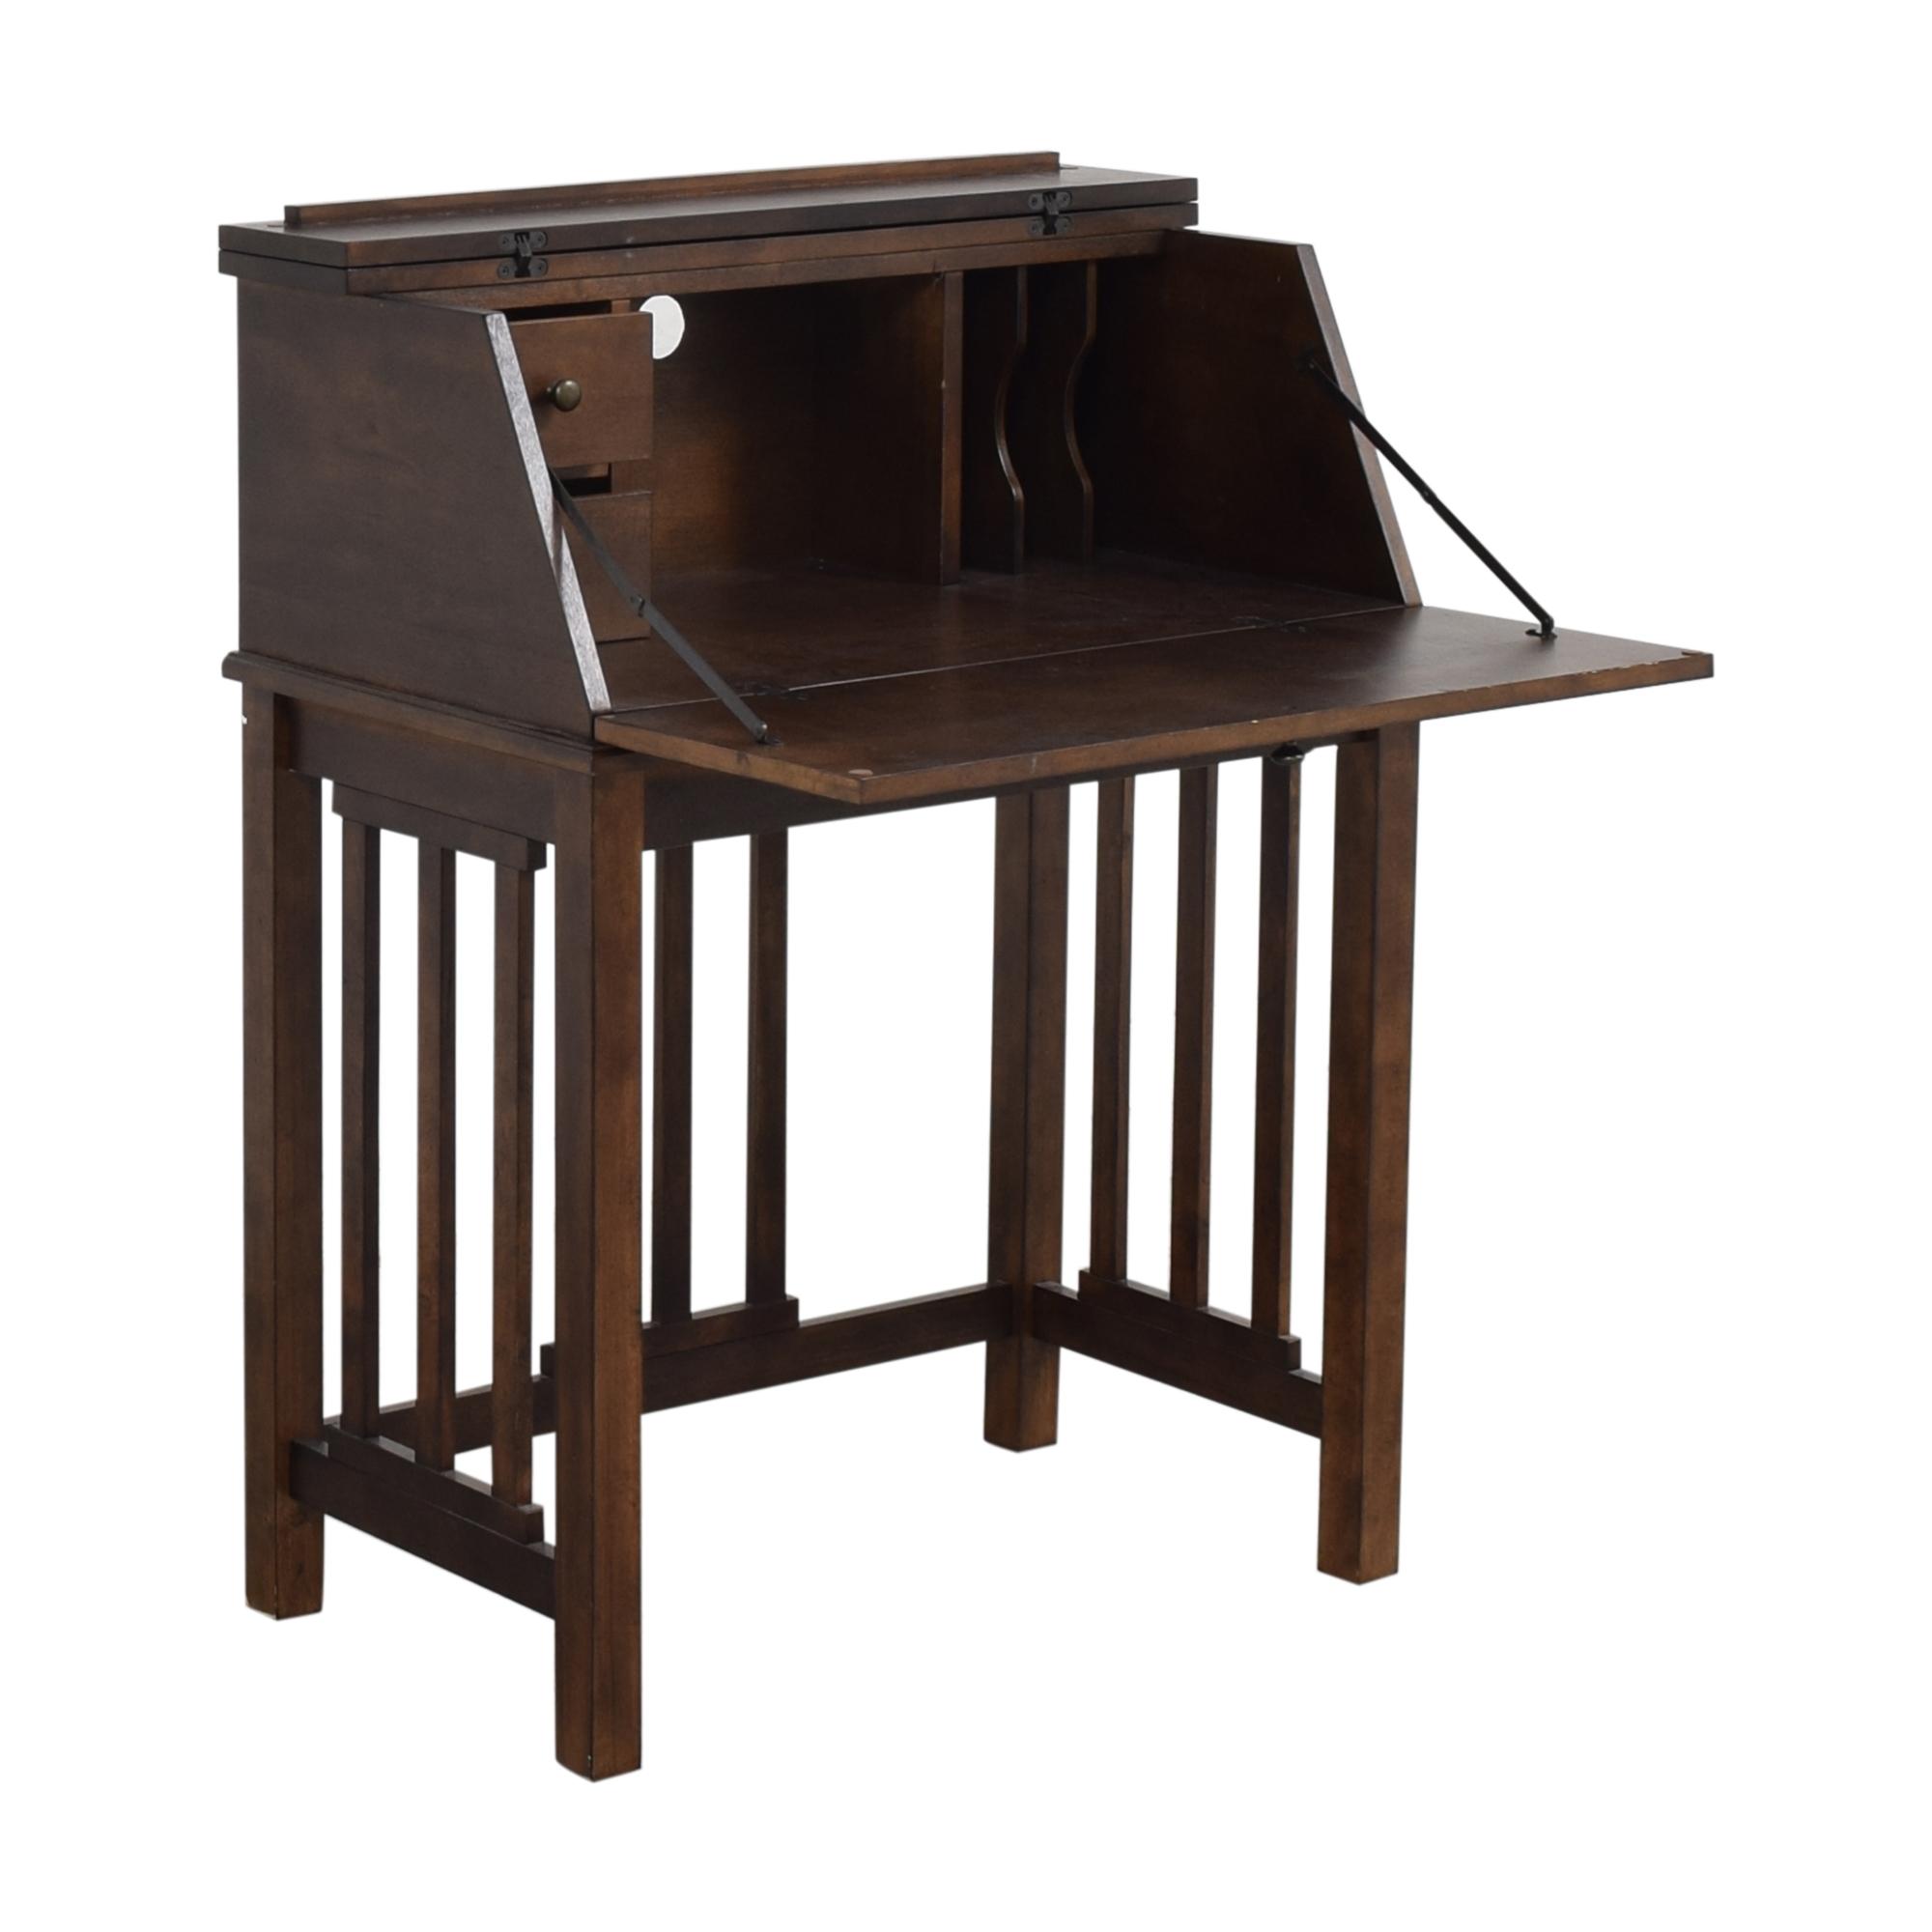 Ashley Furniture Ashley Furniture Harpan Desk brown